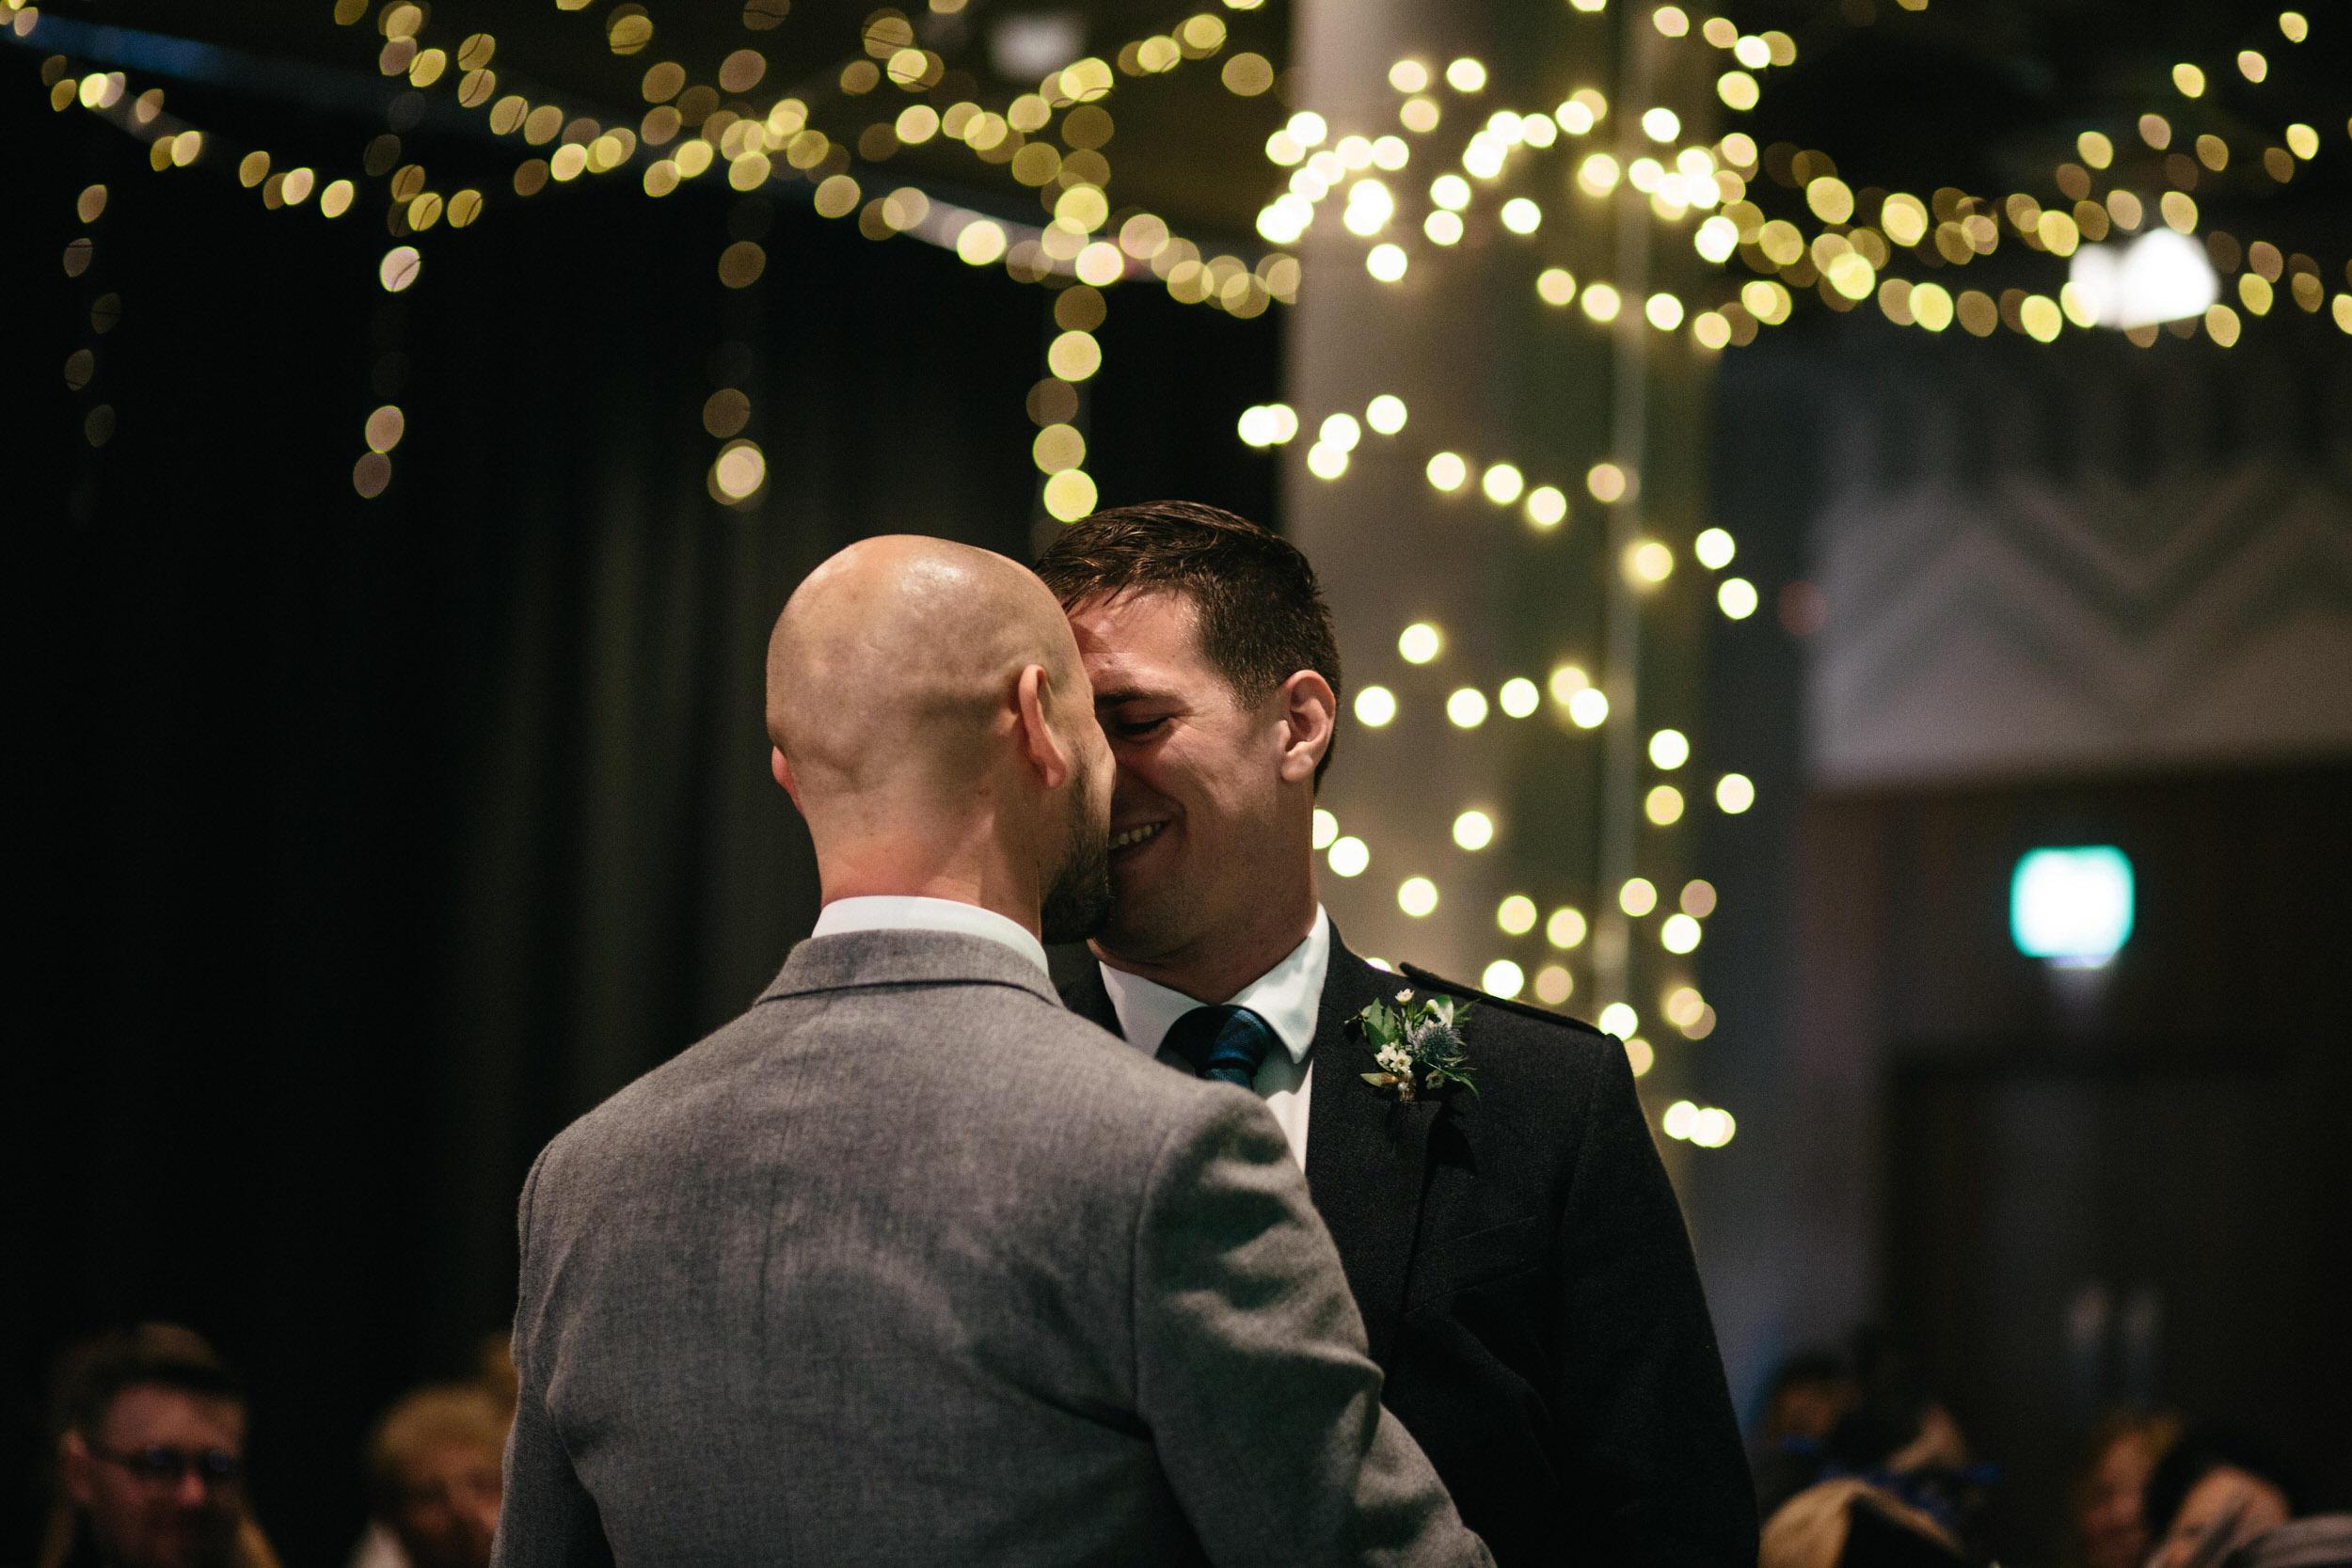 Quirky Wedding Photographer Scotland Glasgow Edinburgh Mirrorbox 069.jpg